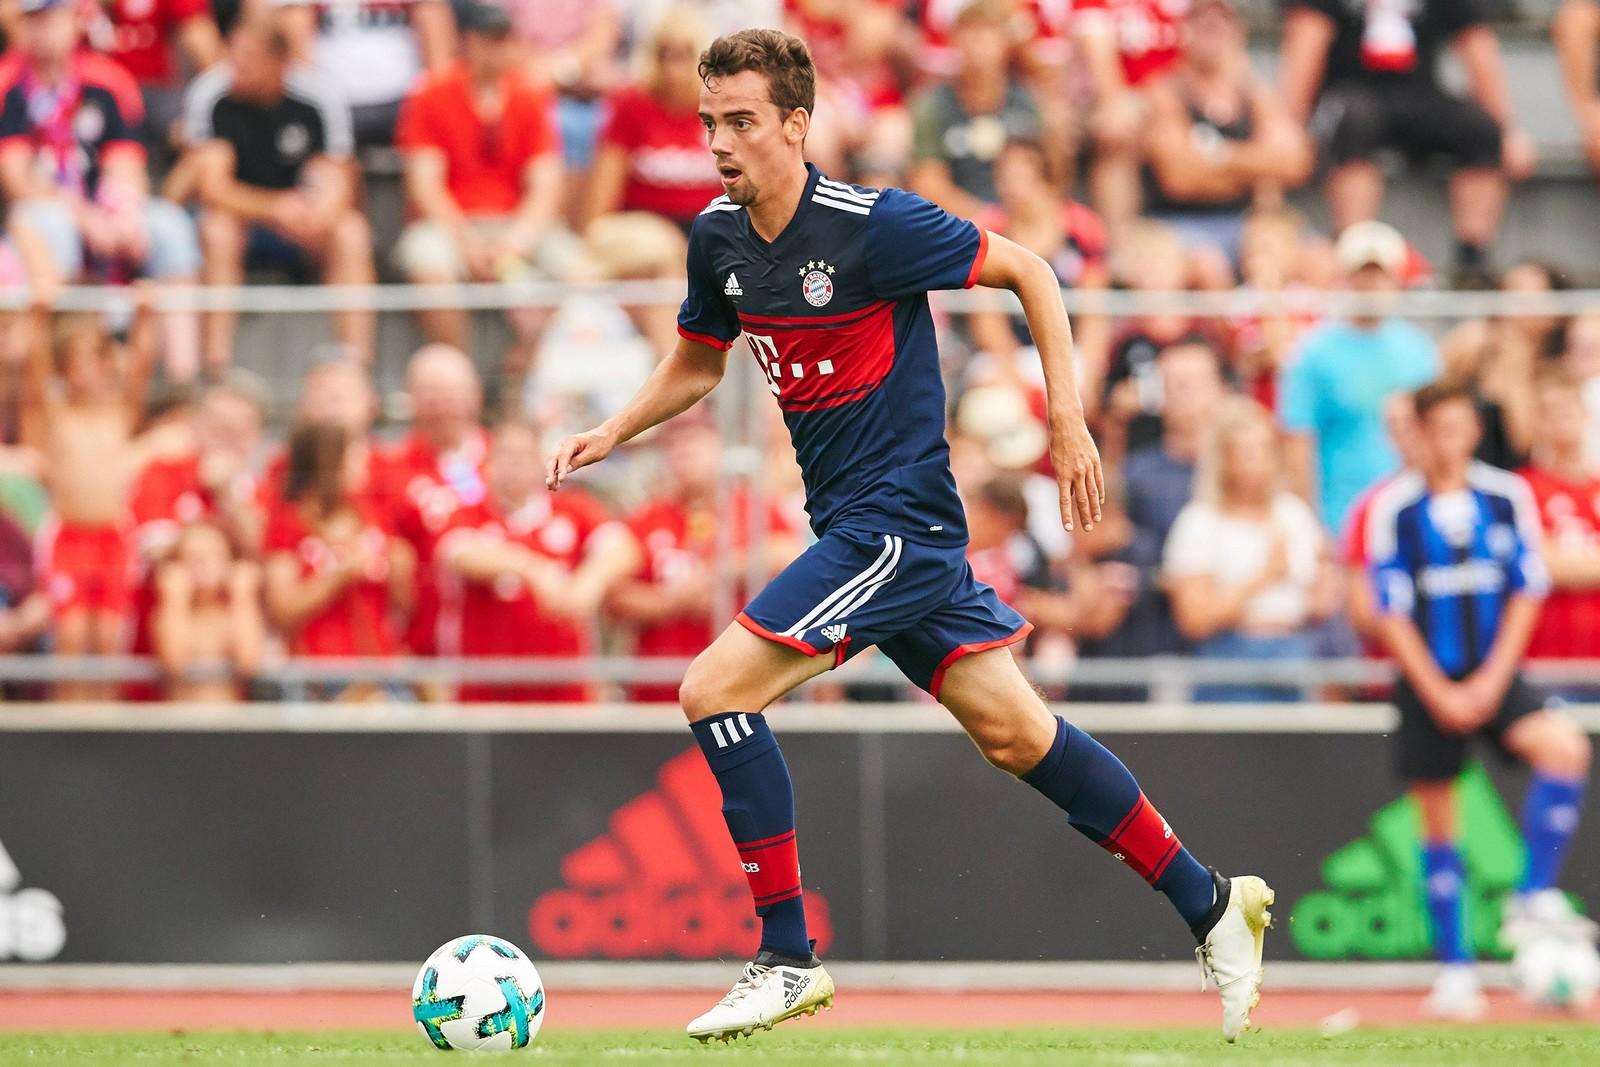 Marco Hingerl im Trikot des FC Bayern